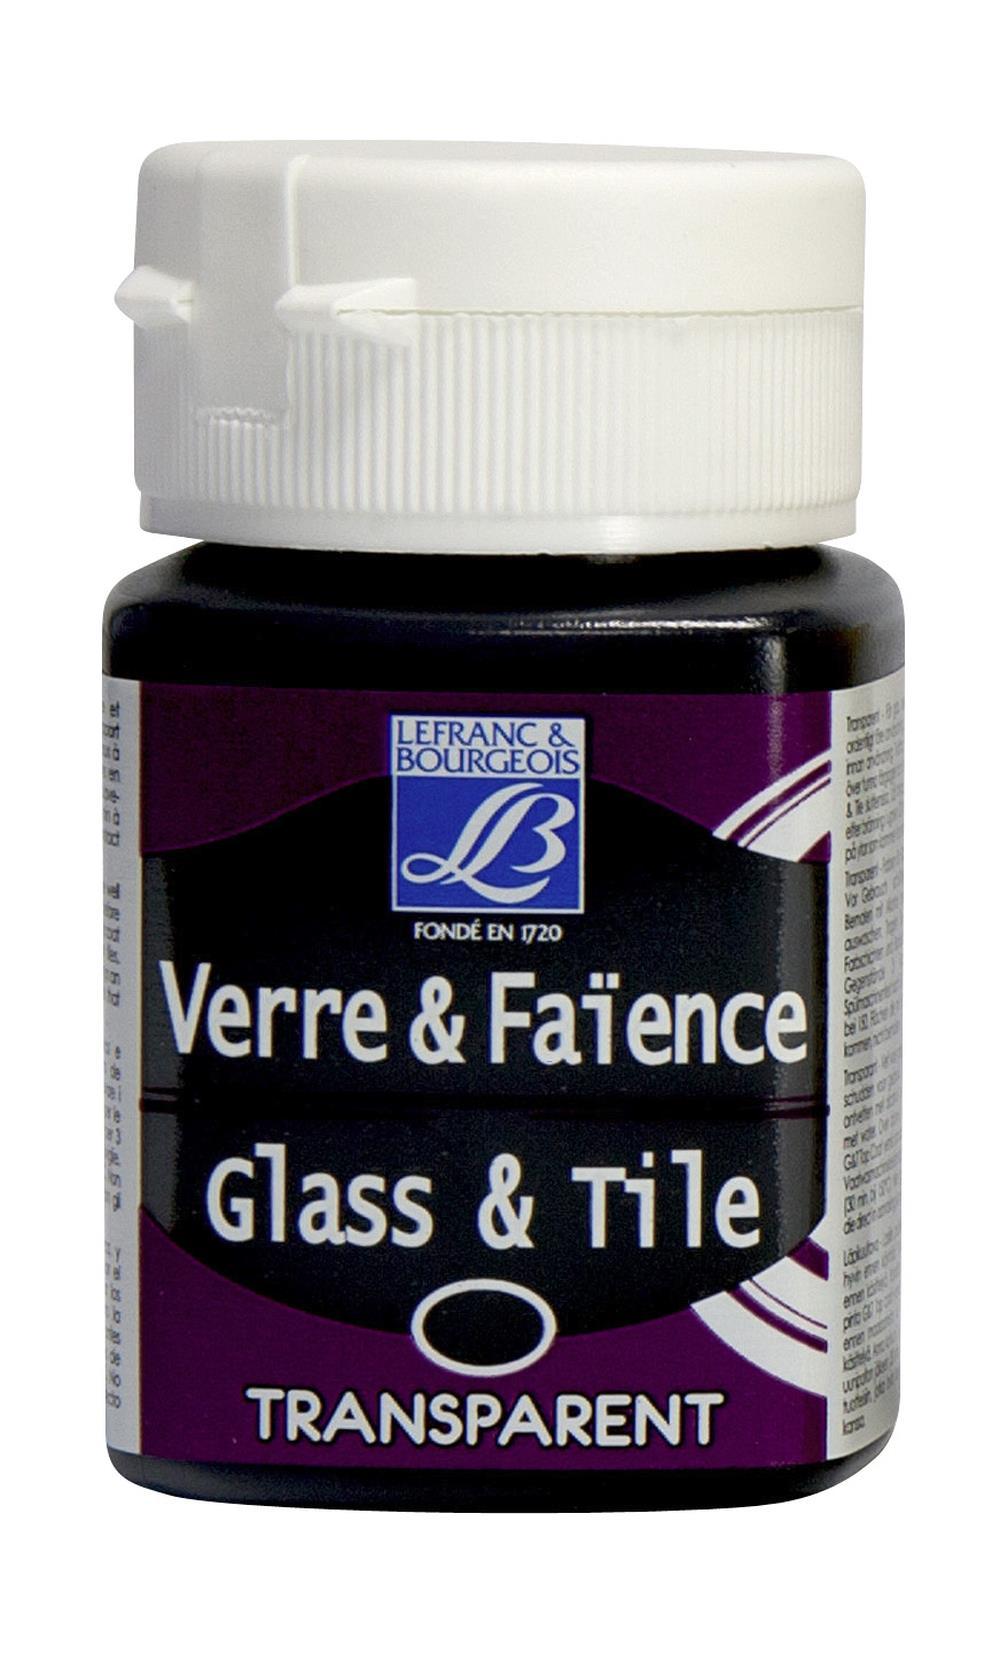 Glas- & keramikfärg L&B 50ml  Choklad, transparent  112 (4F) Utgår